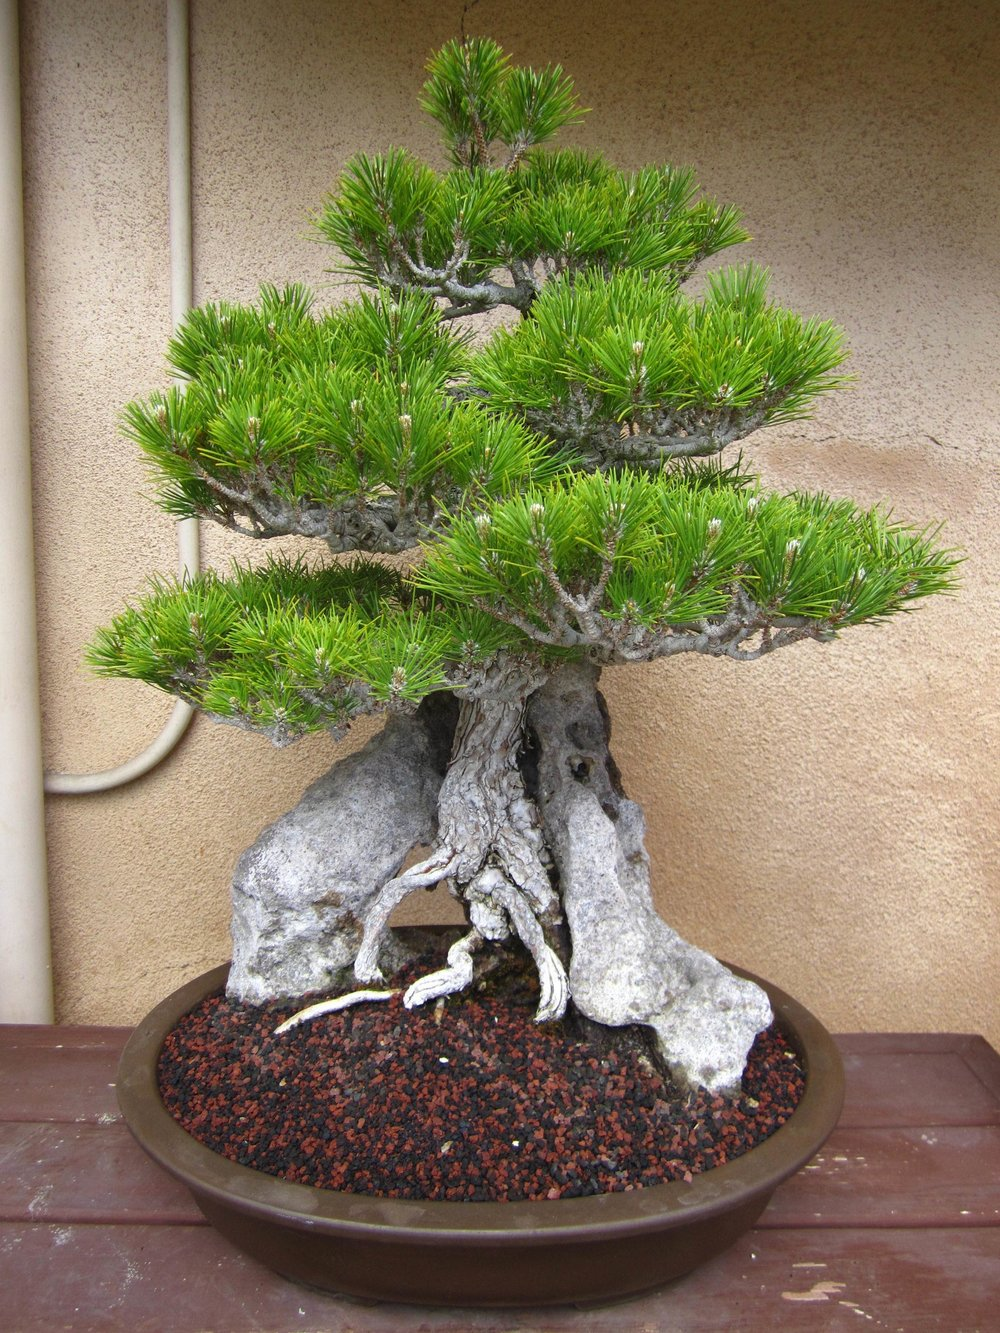 12. Japanese Black Pine